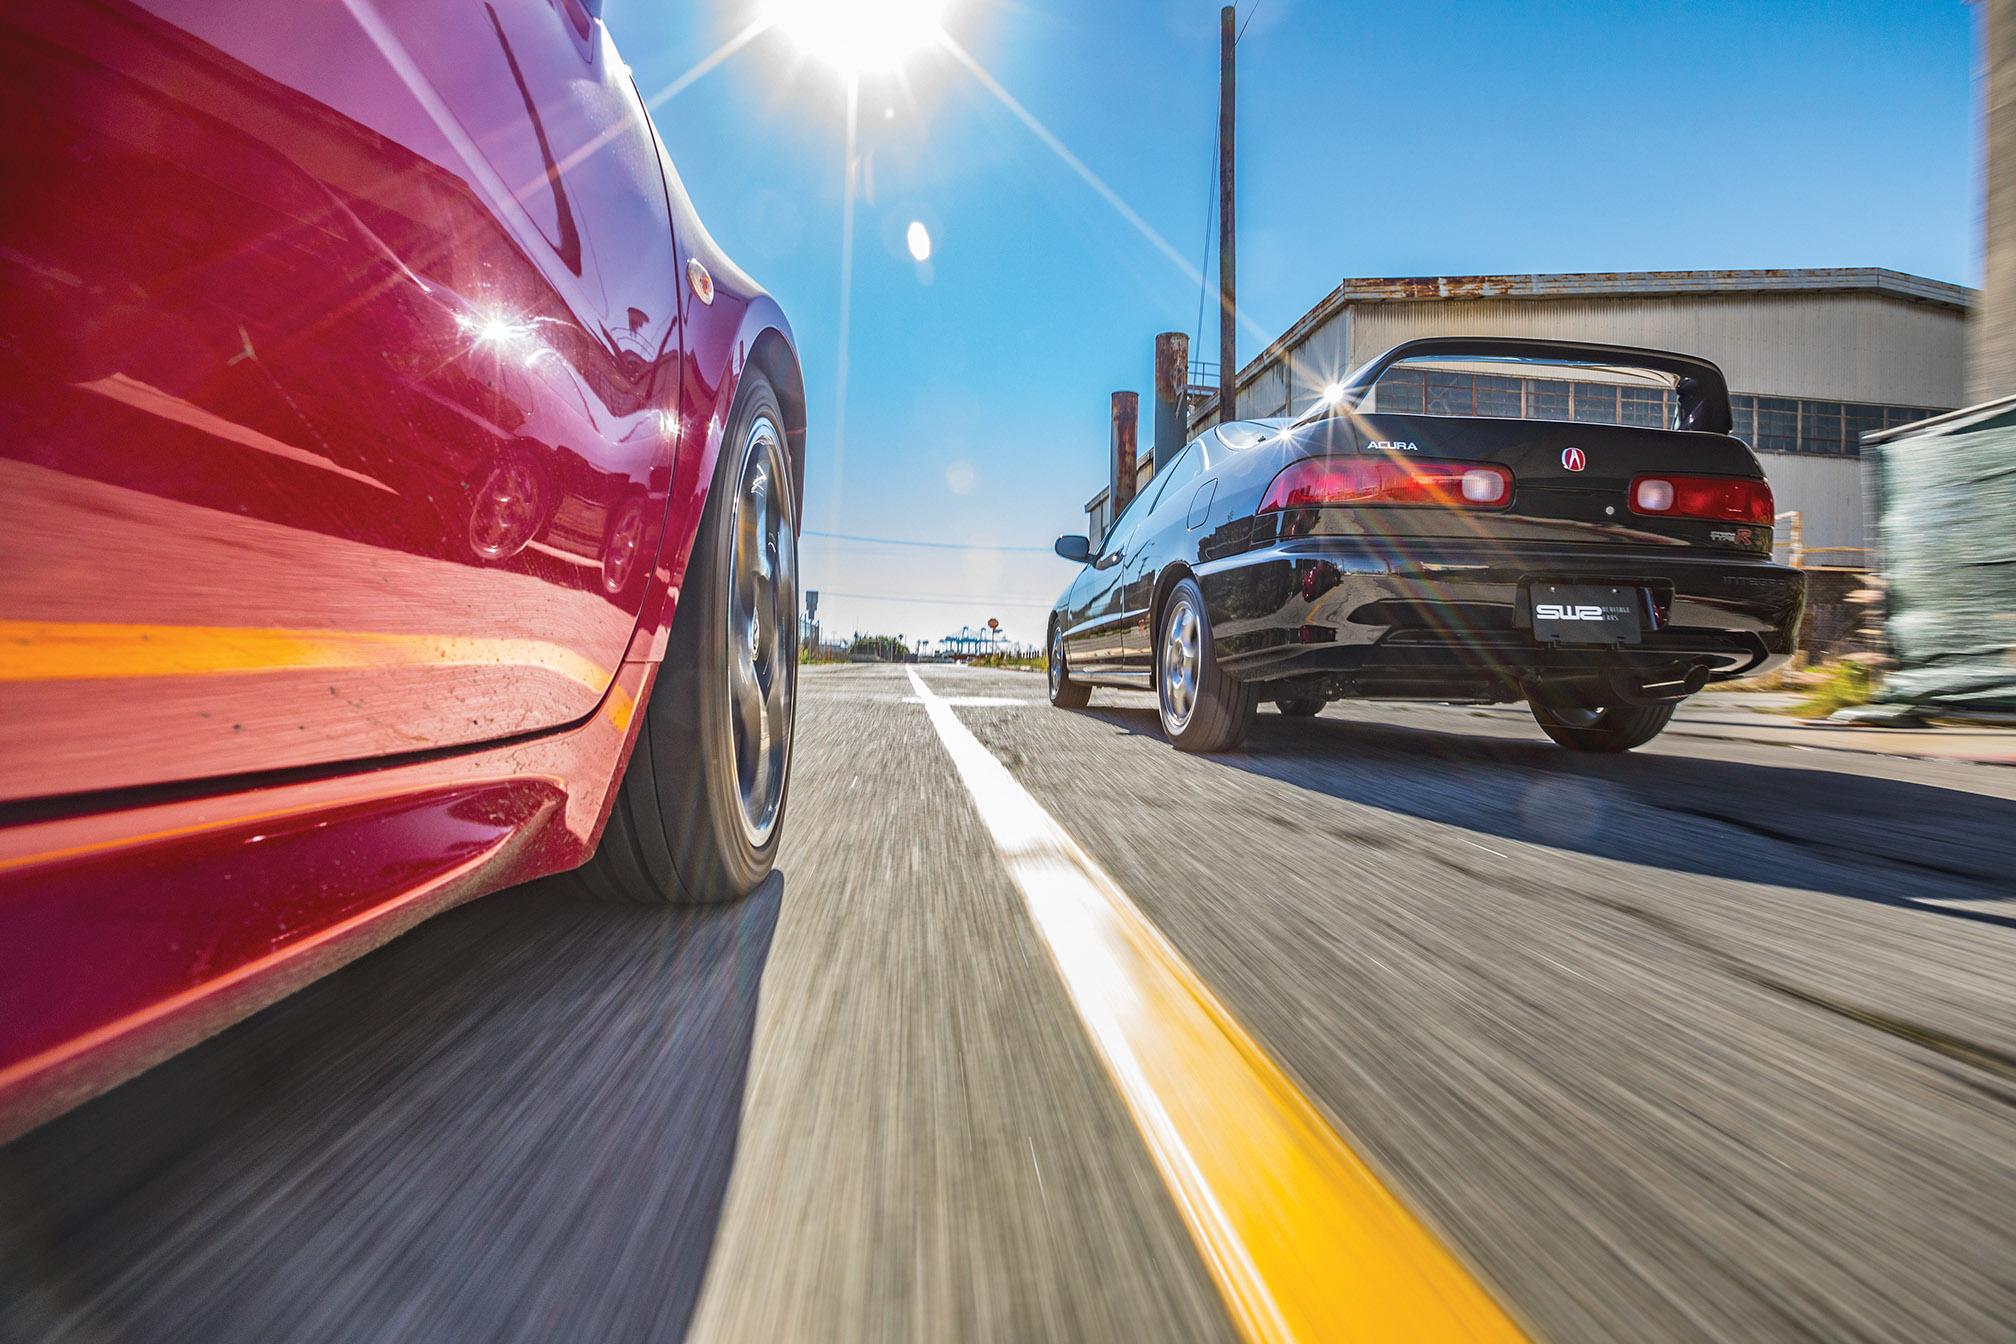 Acura Integra Type R and Alfa Romeo 4C Comparo